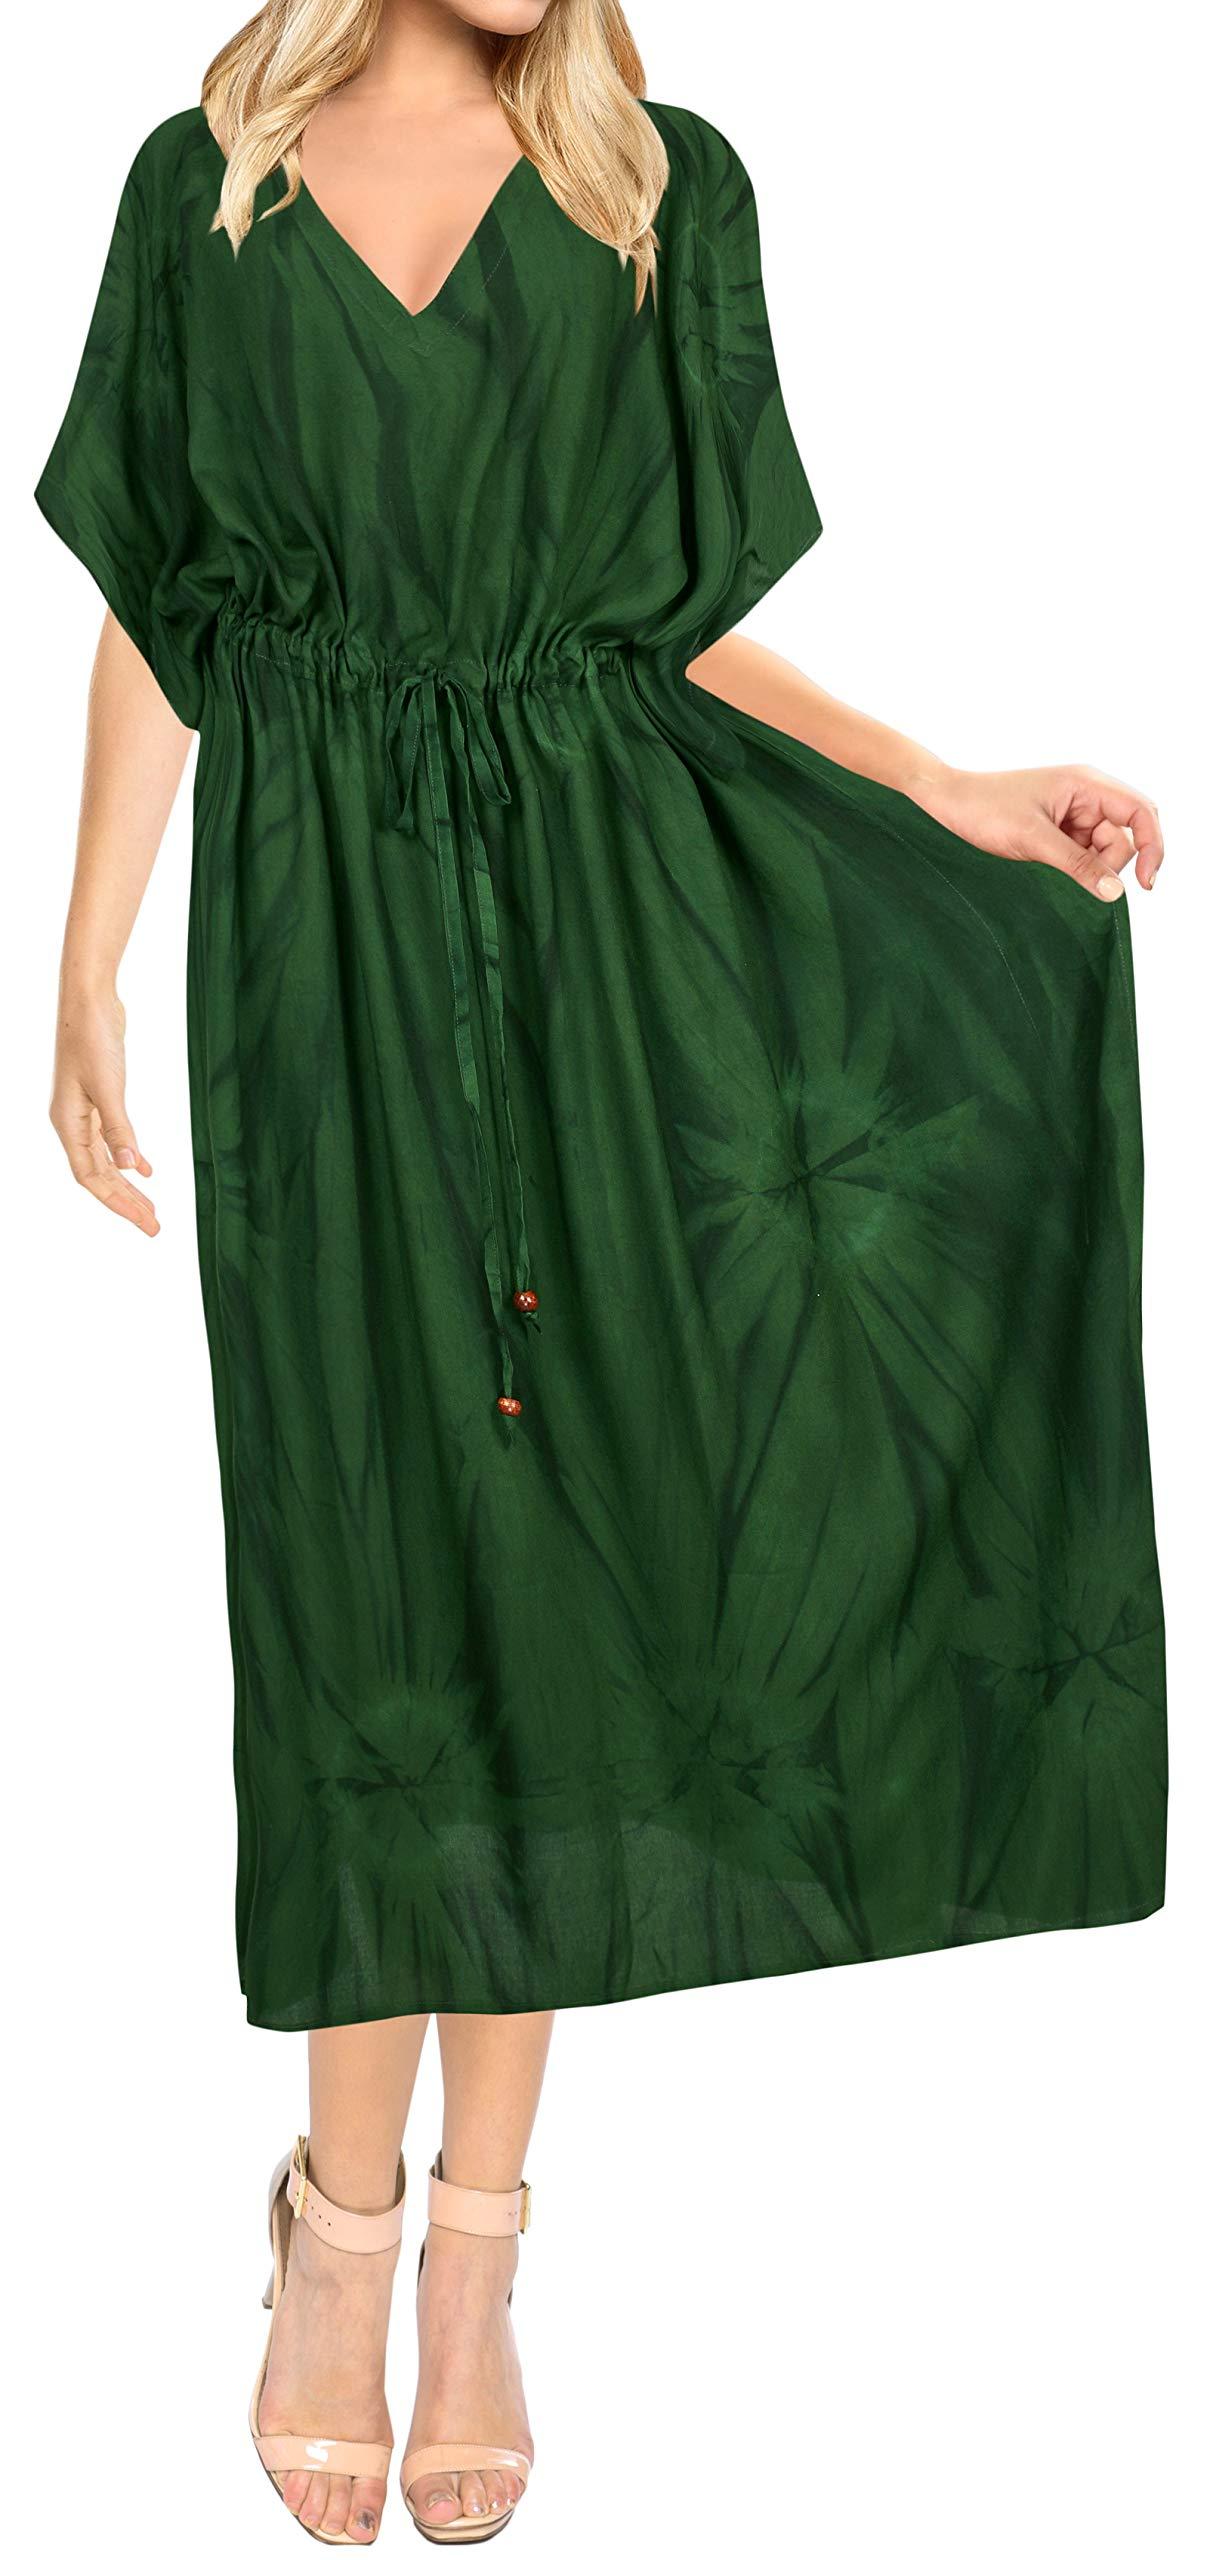 LA LEELA Women's Maxi Kaftan Boho Dress Sleep Wear Swim Cover Ups Embroidered